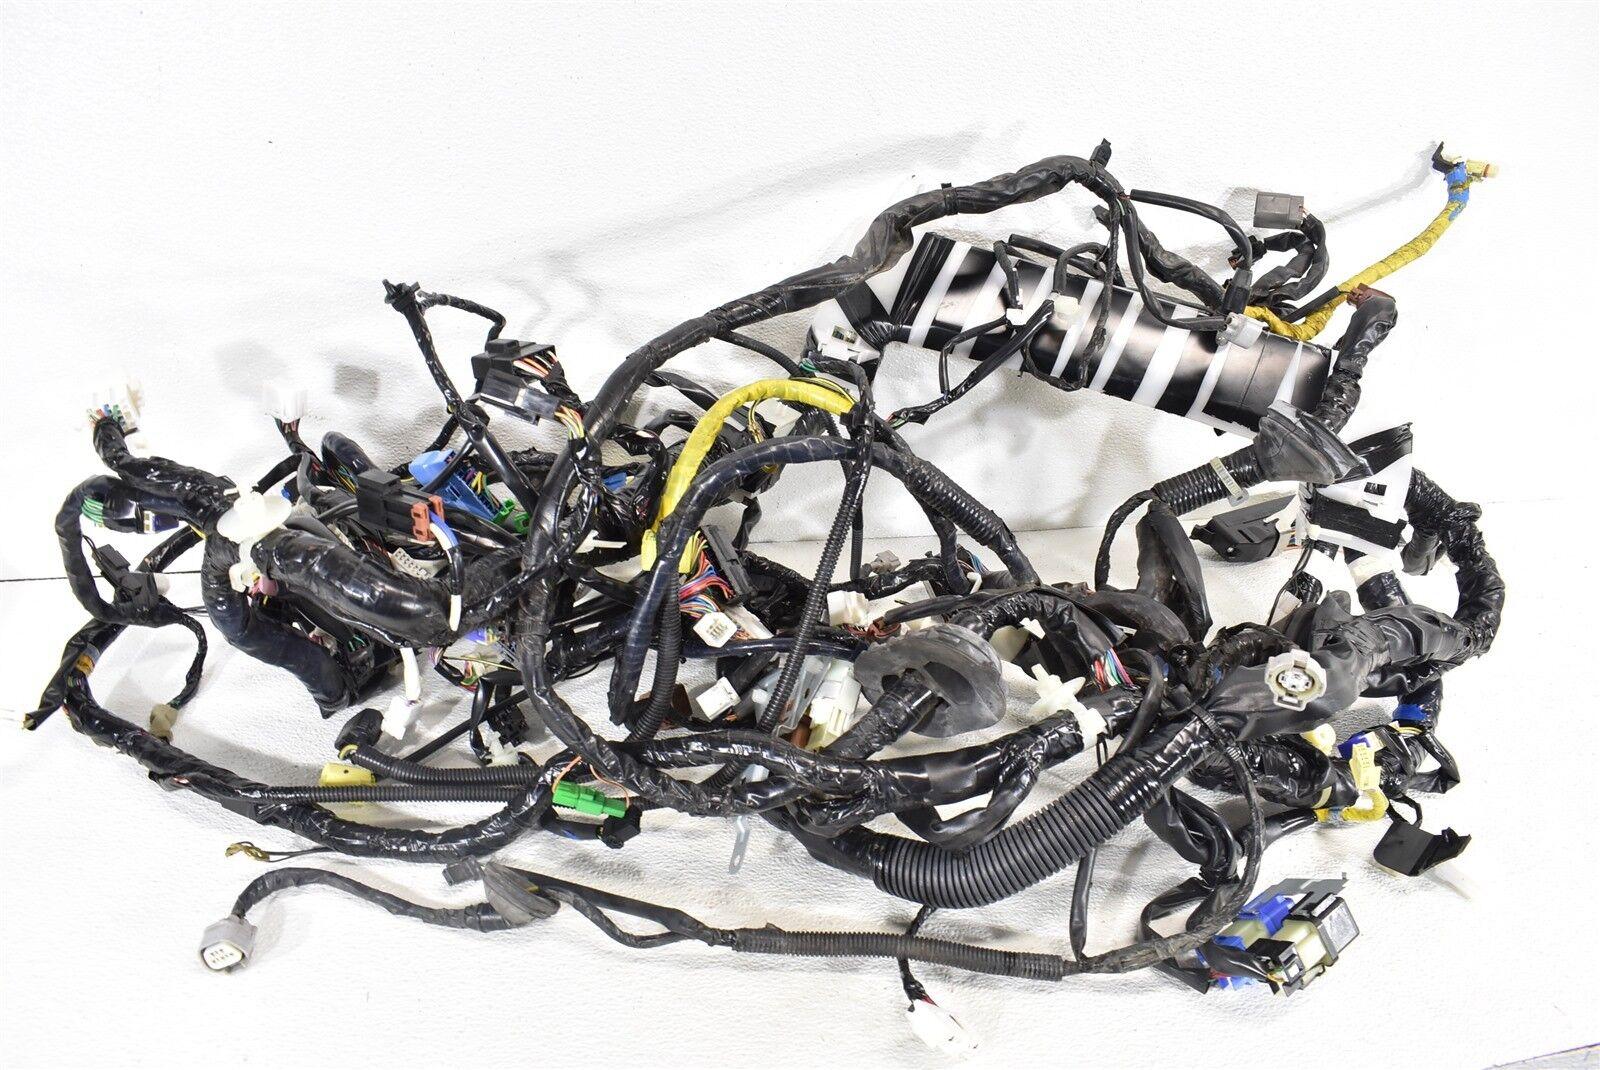 2008 subaru forester xt bulk wiring harness wires wire set 08 | ebay  ebay